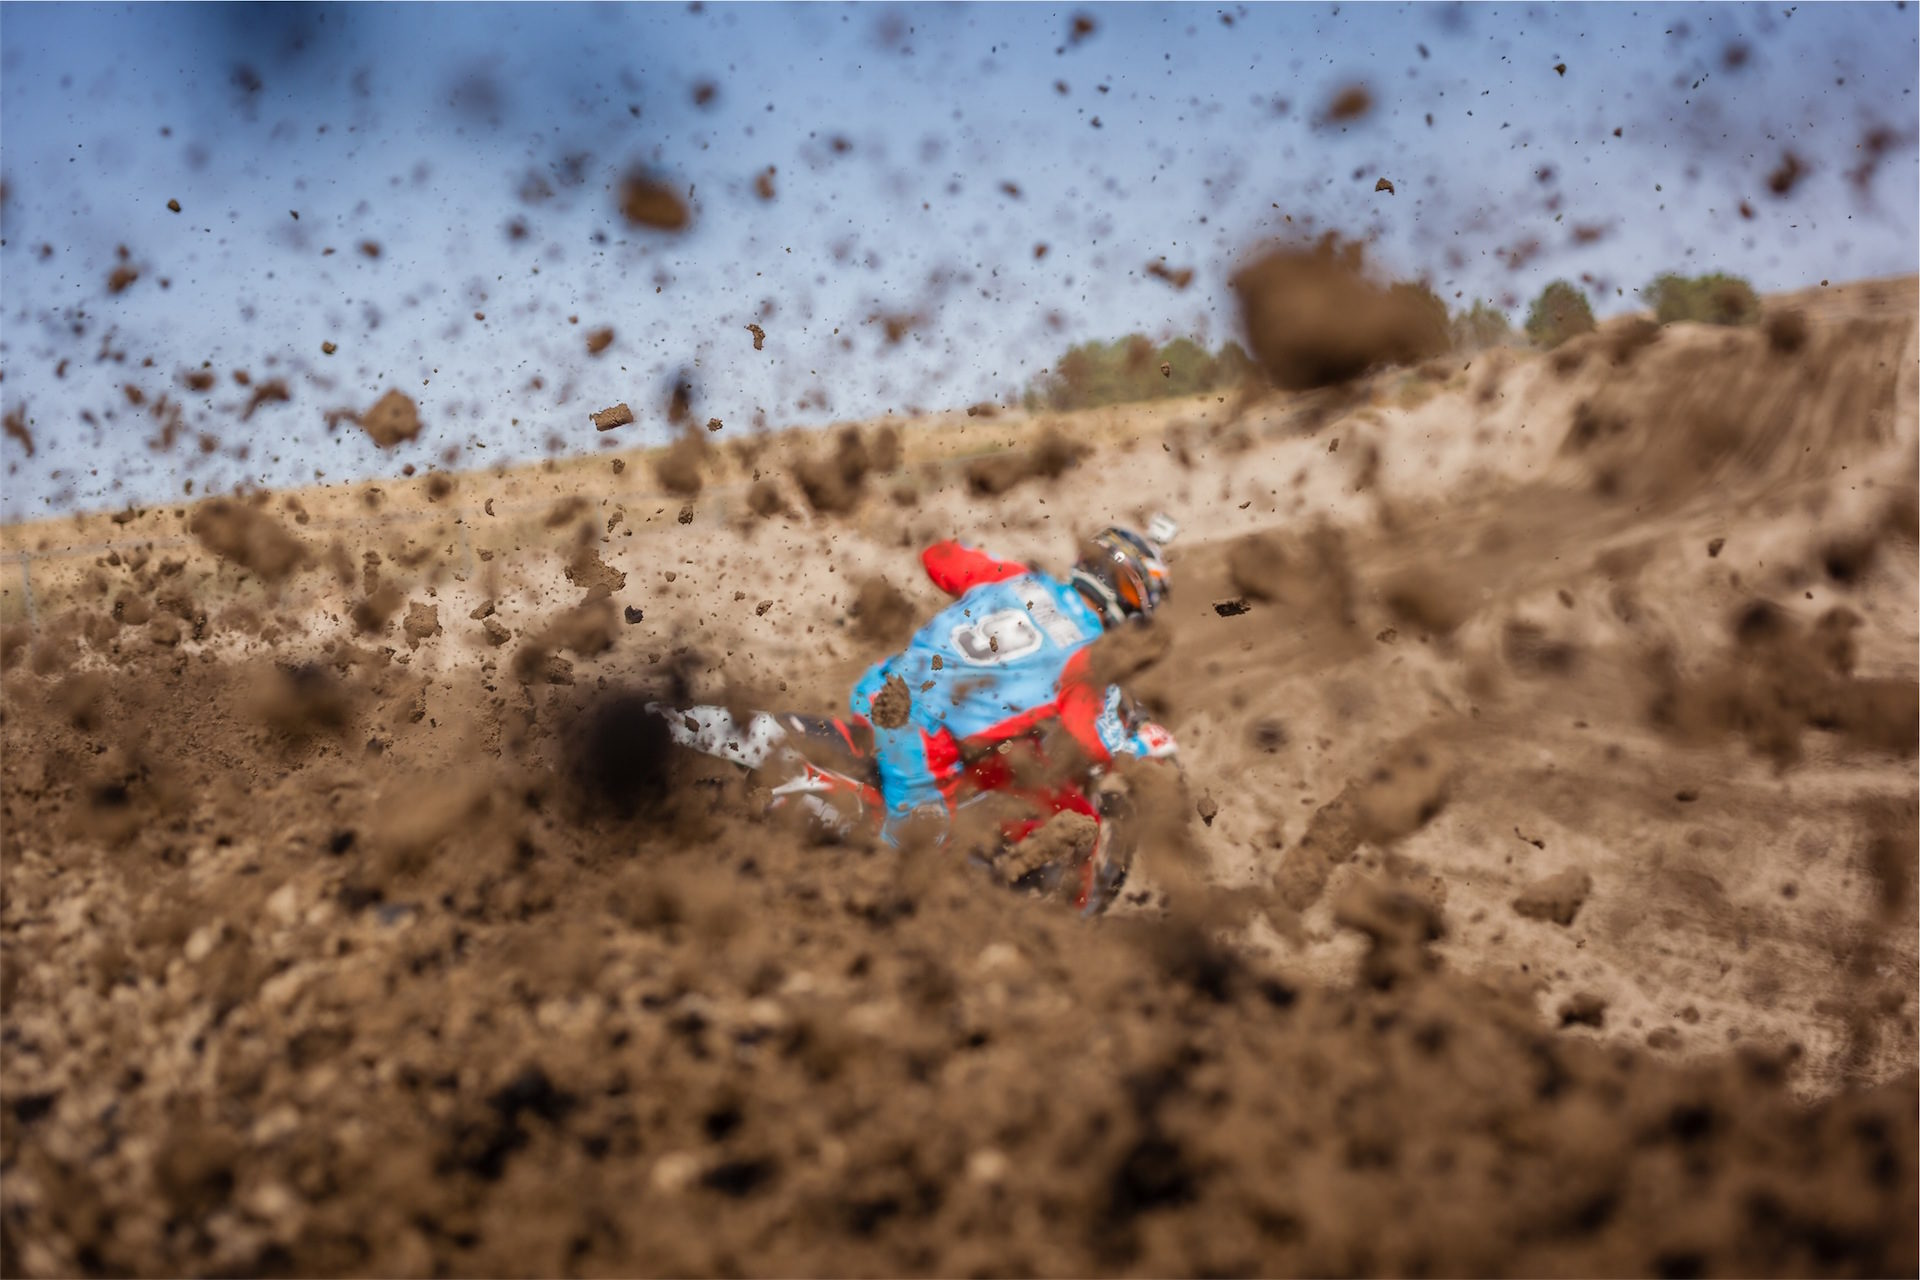 Мотокросс, мотоцикл, грязи, дрейф, риск - Обои HD - Профессор falken.com